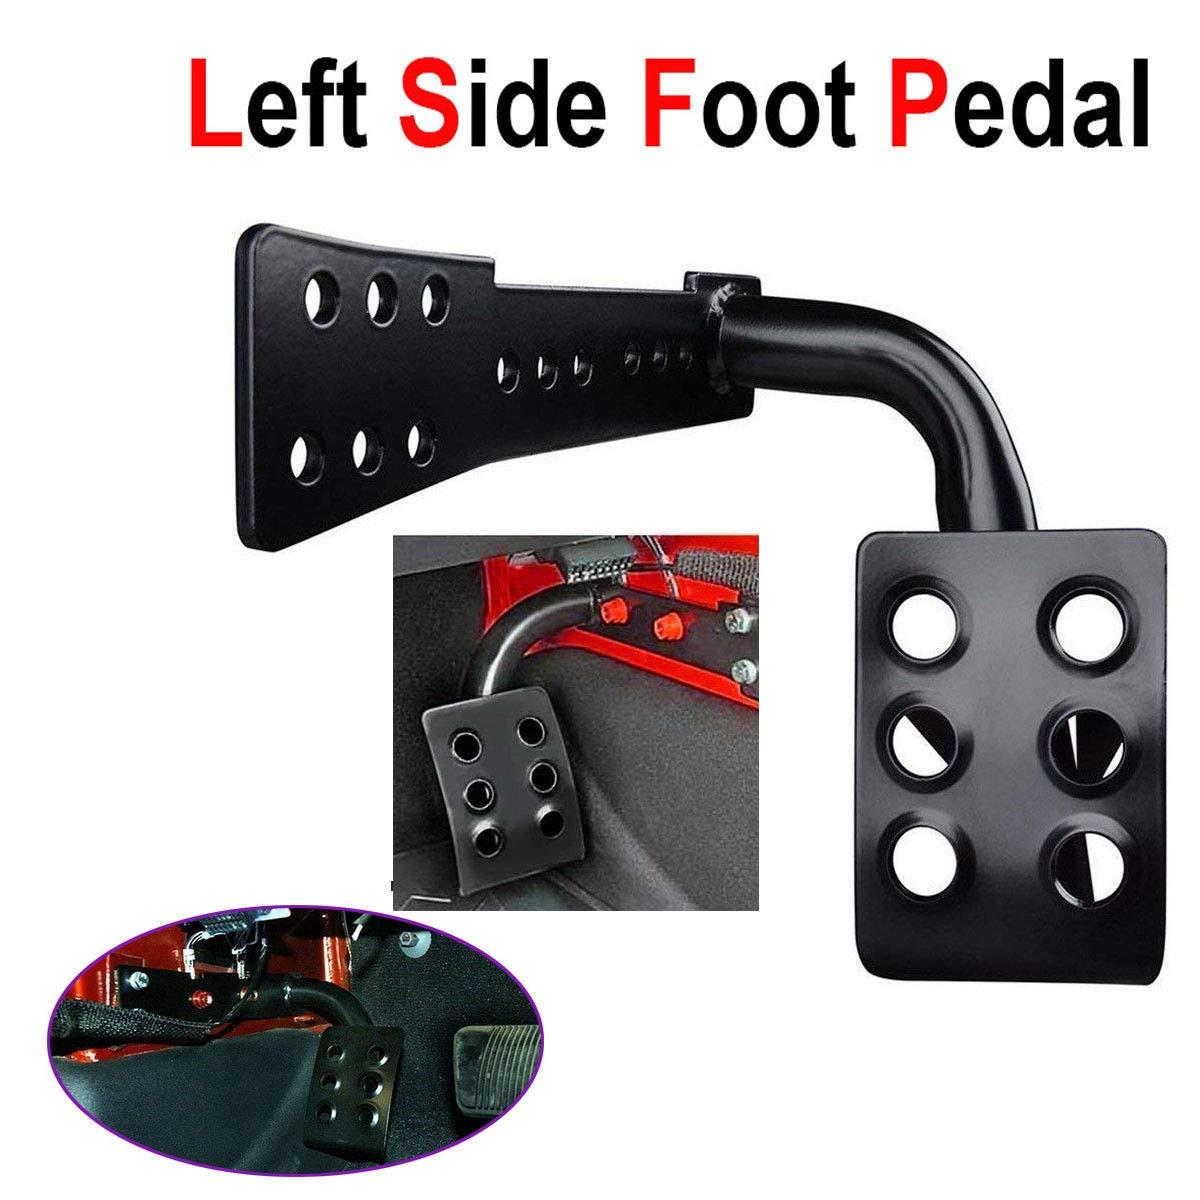 Metermall Poggiapiedi Metal Dead Pedal Left Side Poggiapiedi a Pedale per 2007-2017 Jeep Wrangler JK